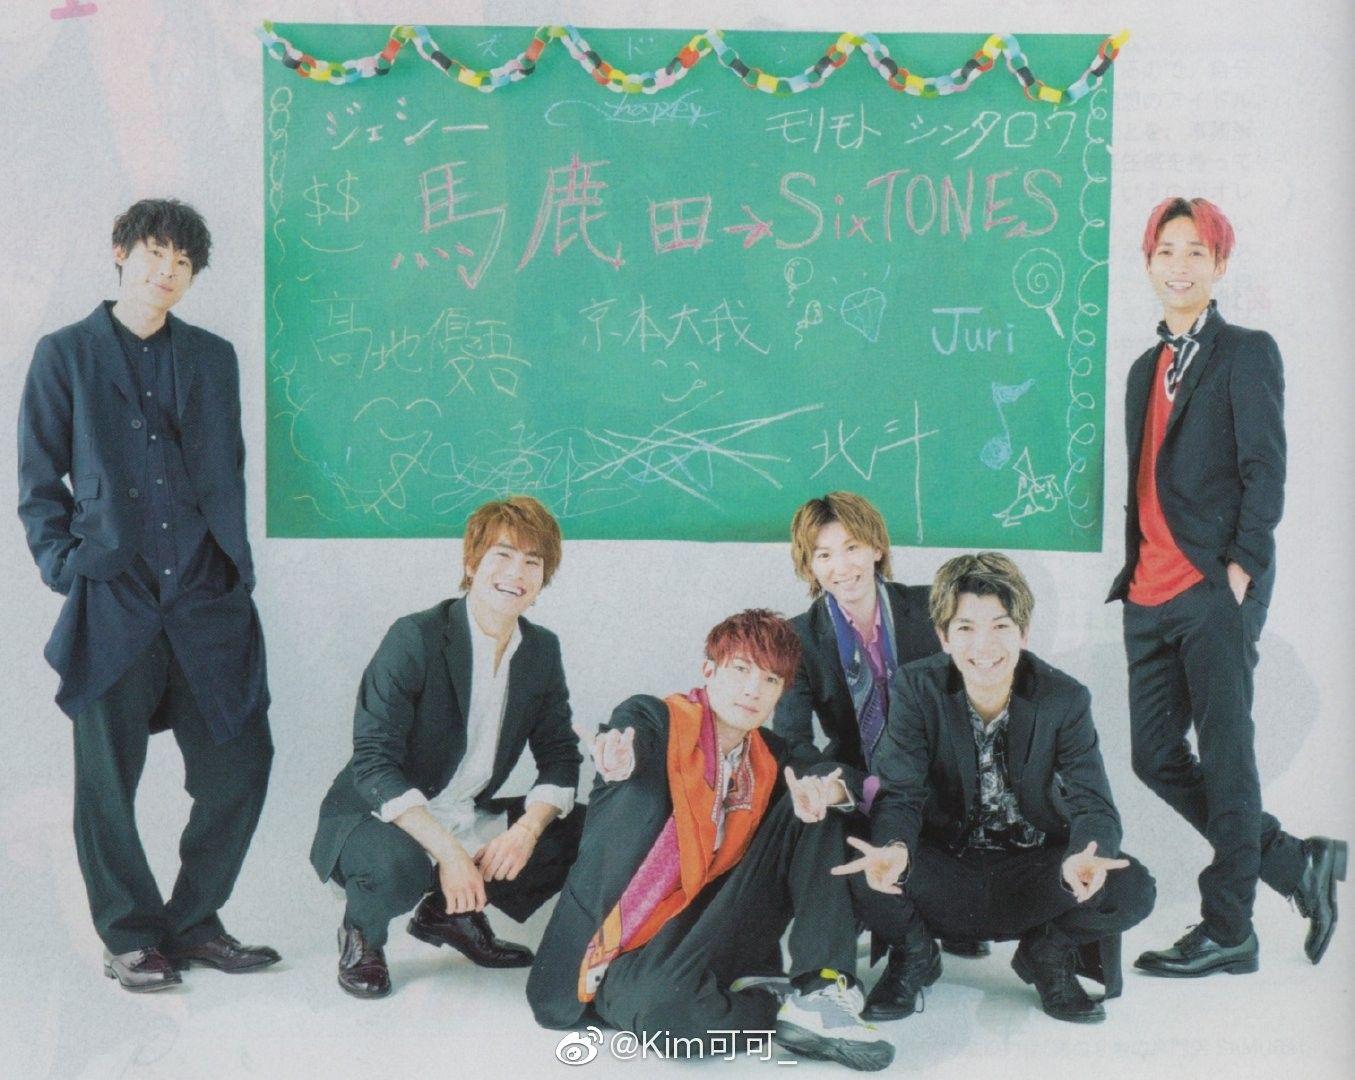 Sixtones おしゃれまとめの人気アイデア Pinterest Murasaki Tseng 2020 きょも